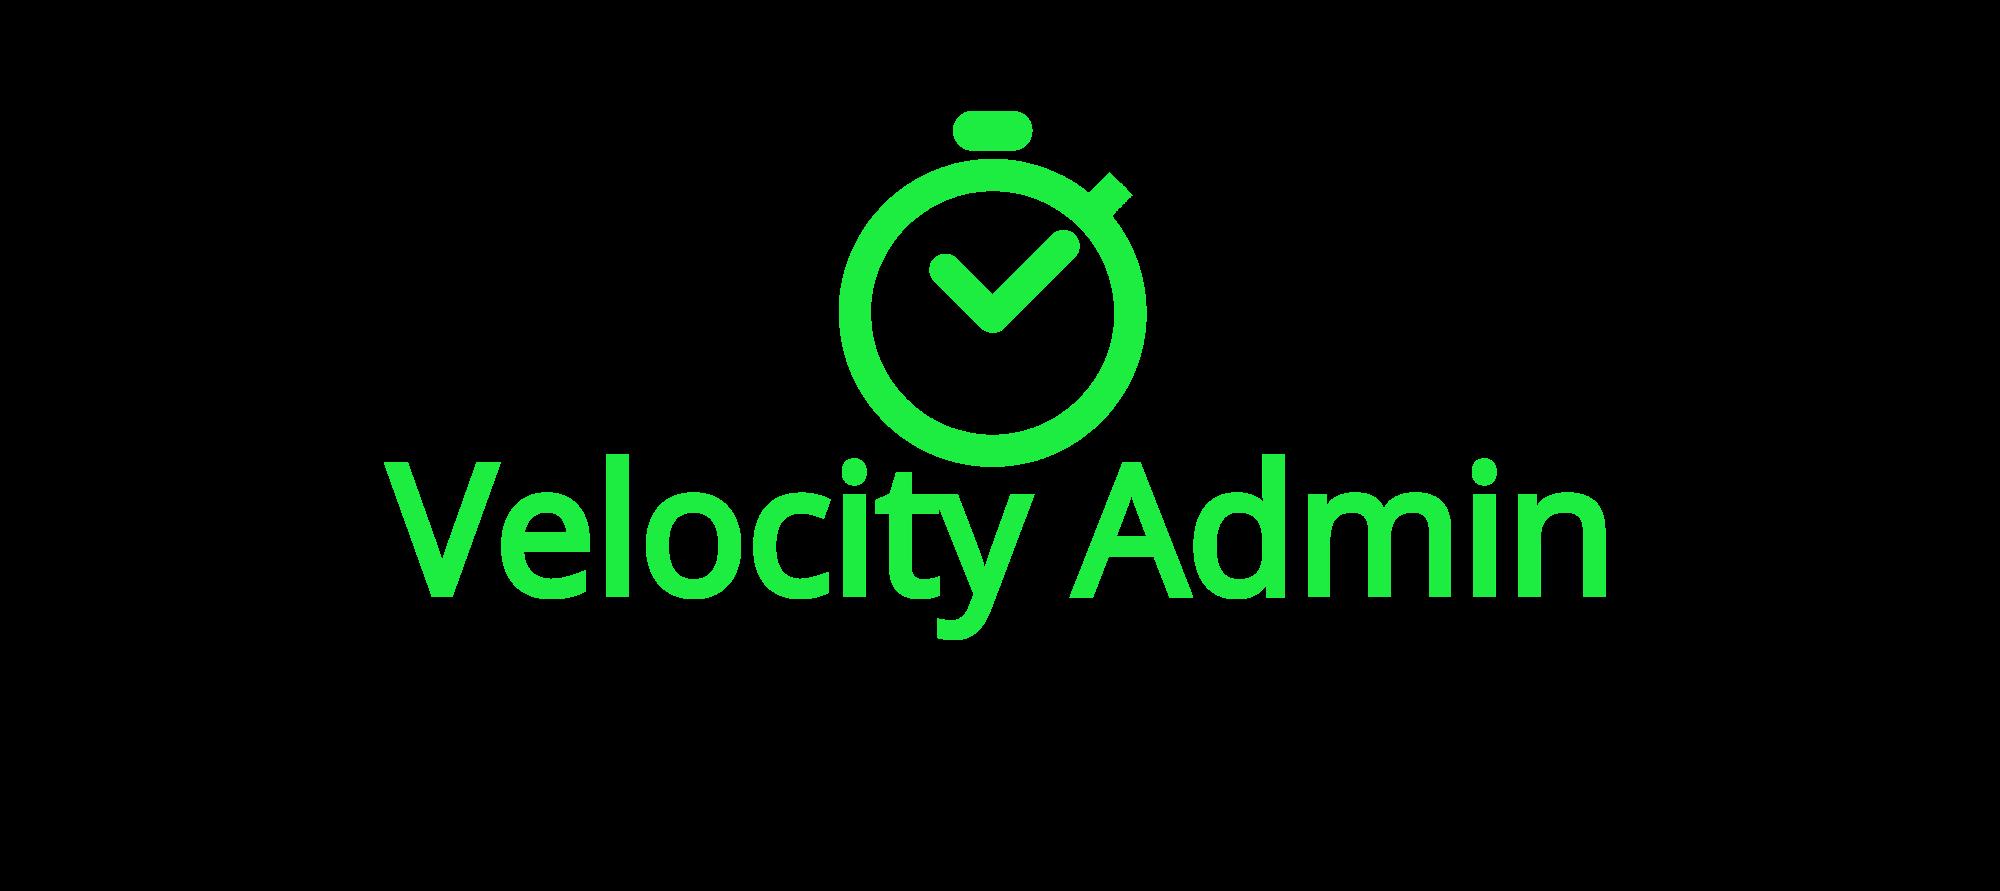 Velocity Admin-logo.png